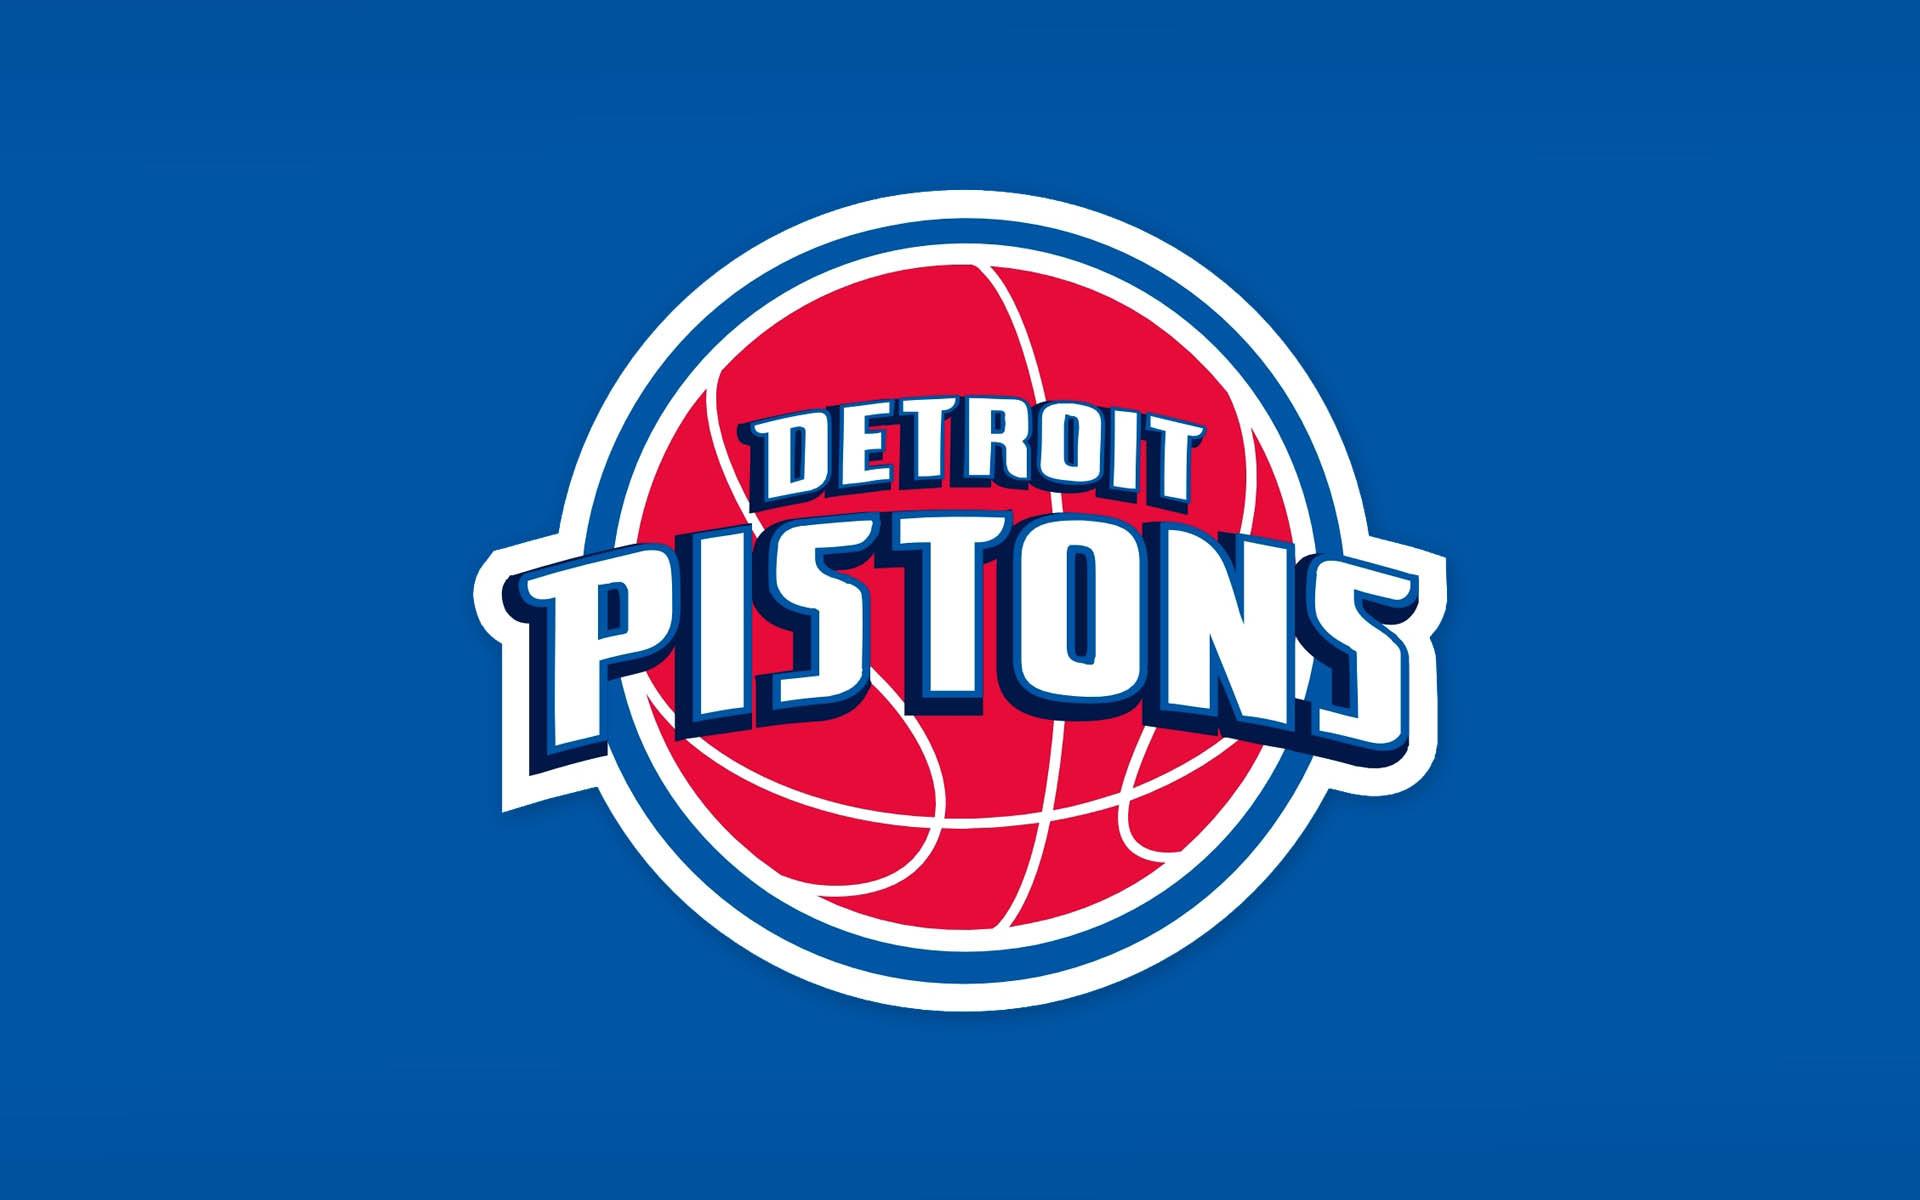 HD Detroit Pistons Wallpapers.